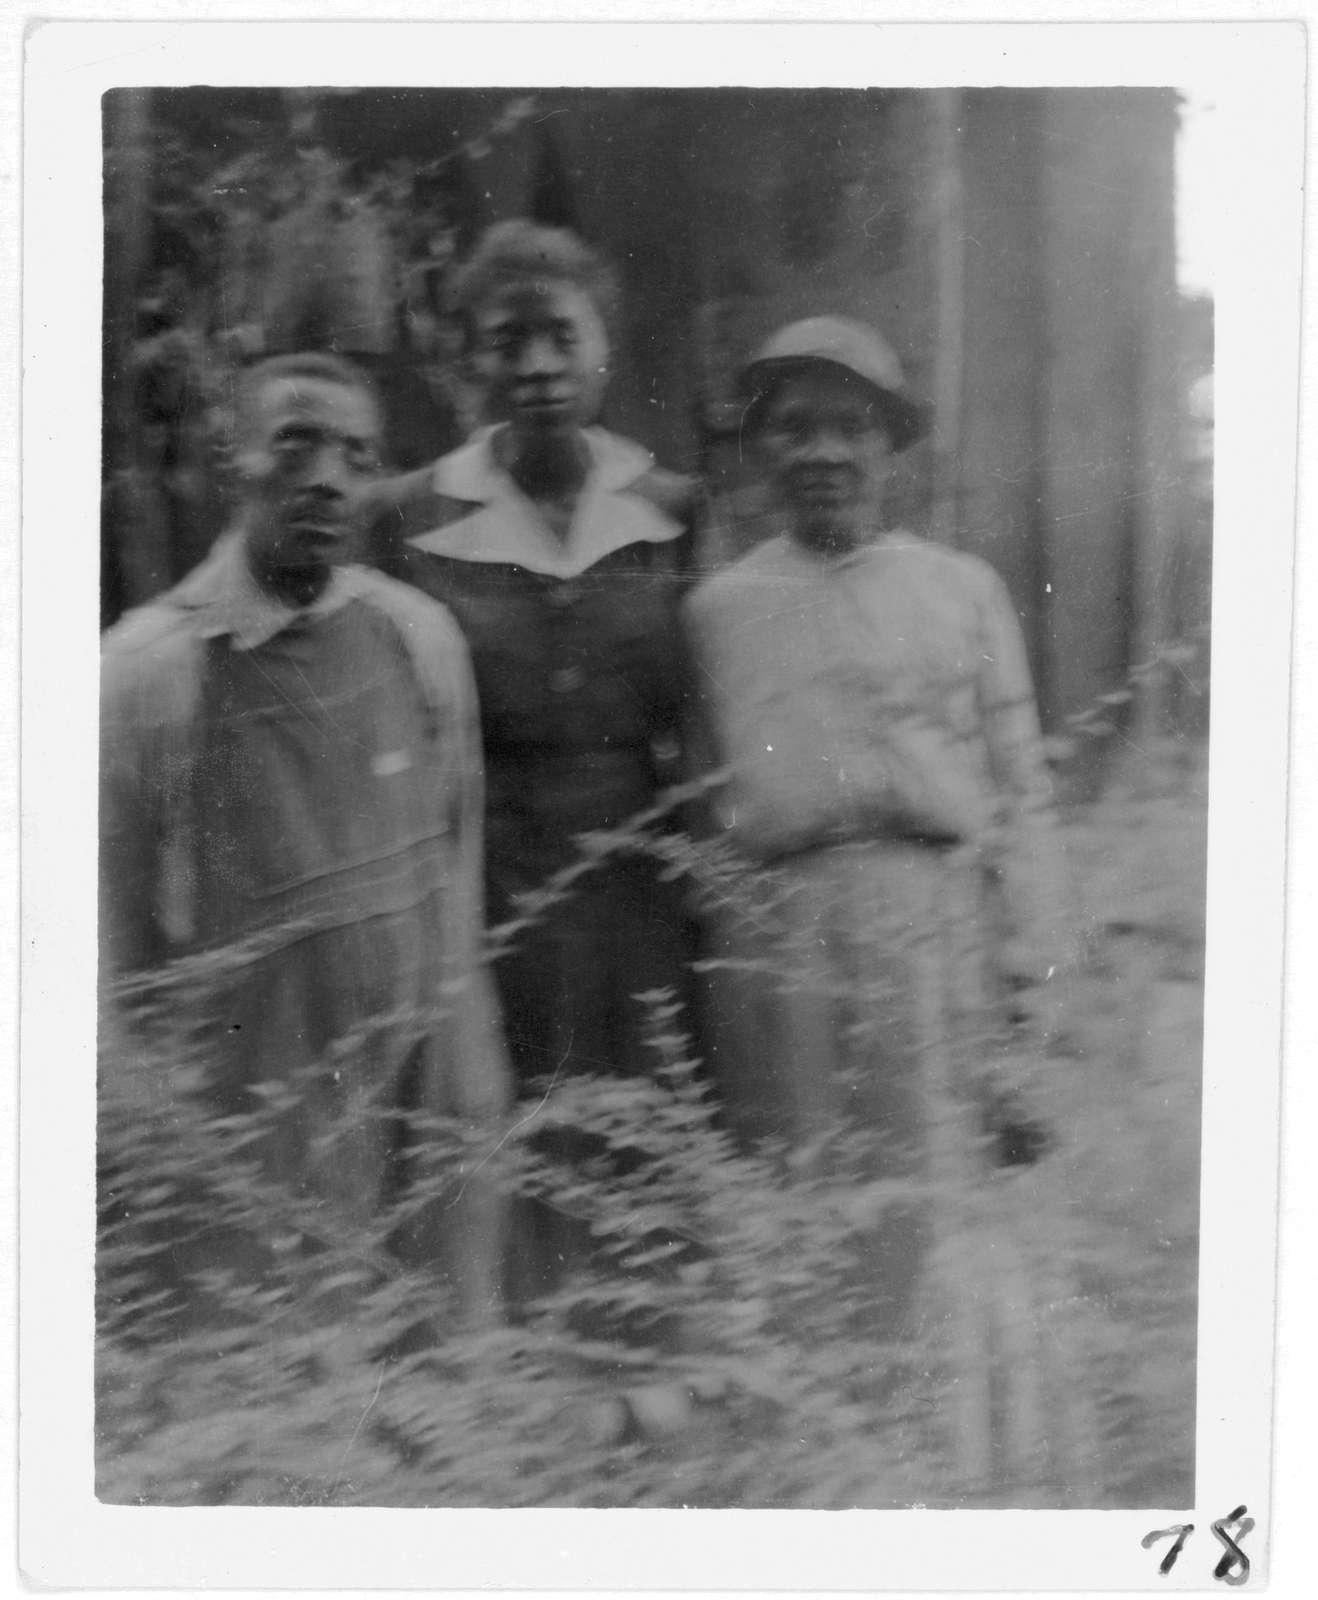 [Uncle Joe McDonald, Aunt Mollie McDonald, and daughter Janie McDonald, outside their farm home, near Livingston, Ala.]